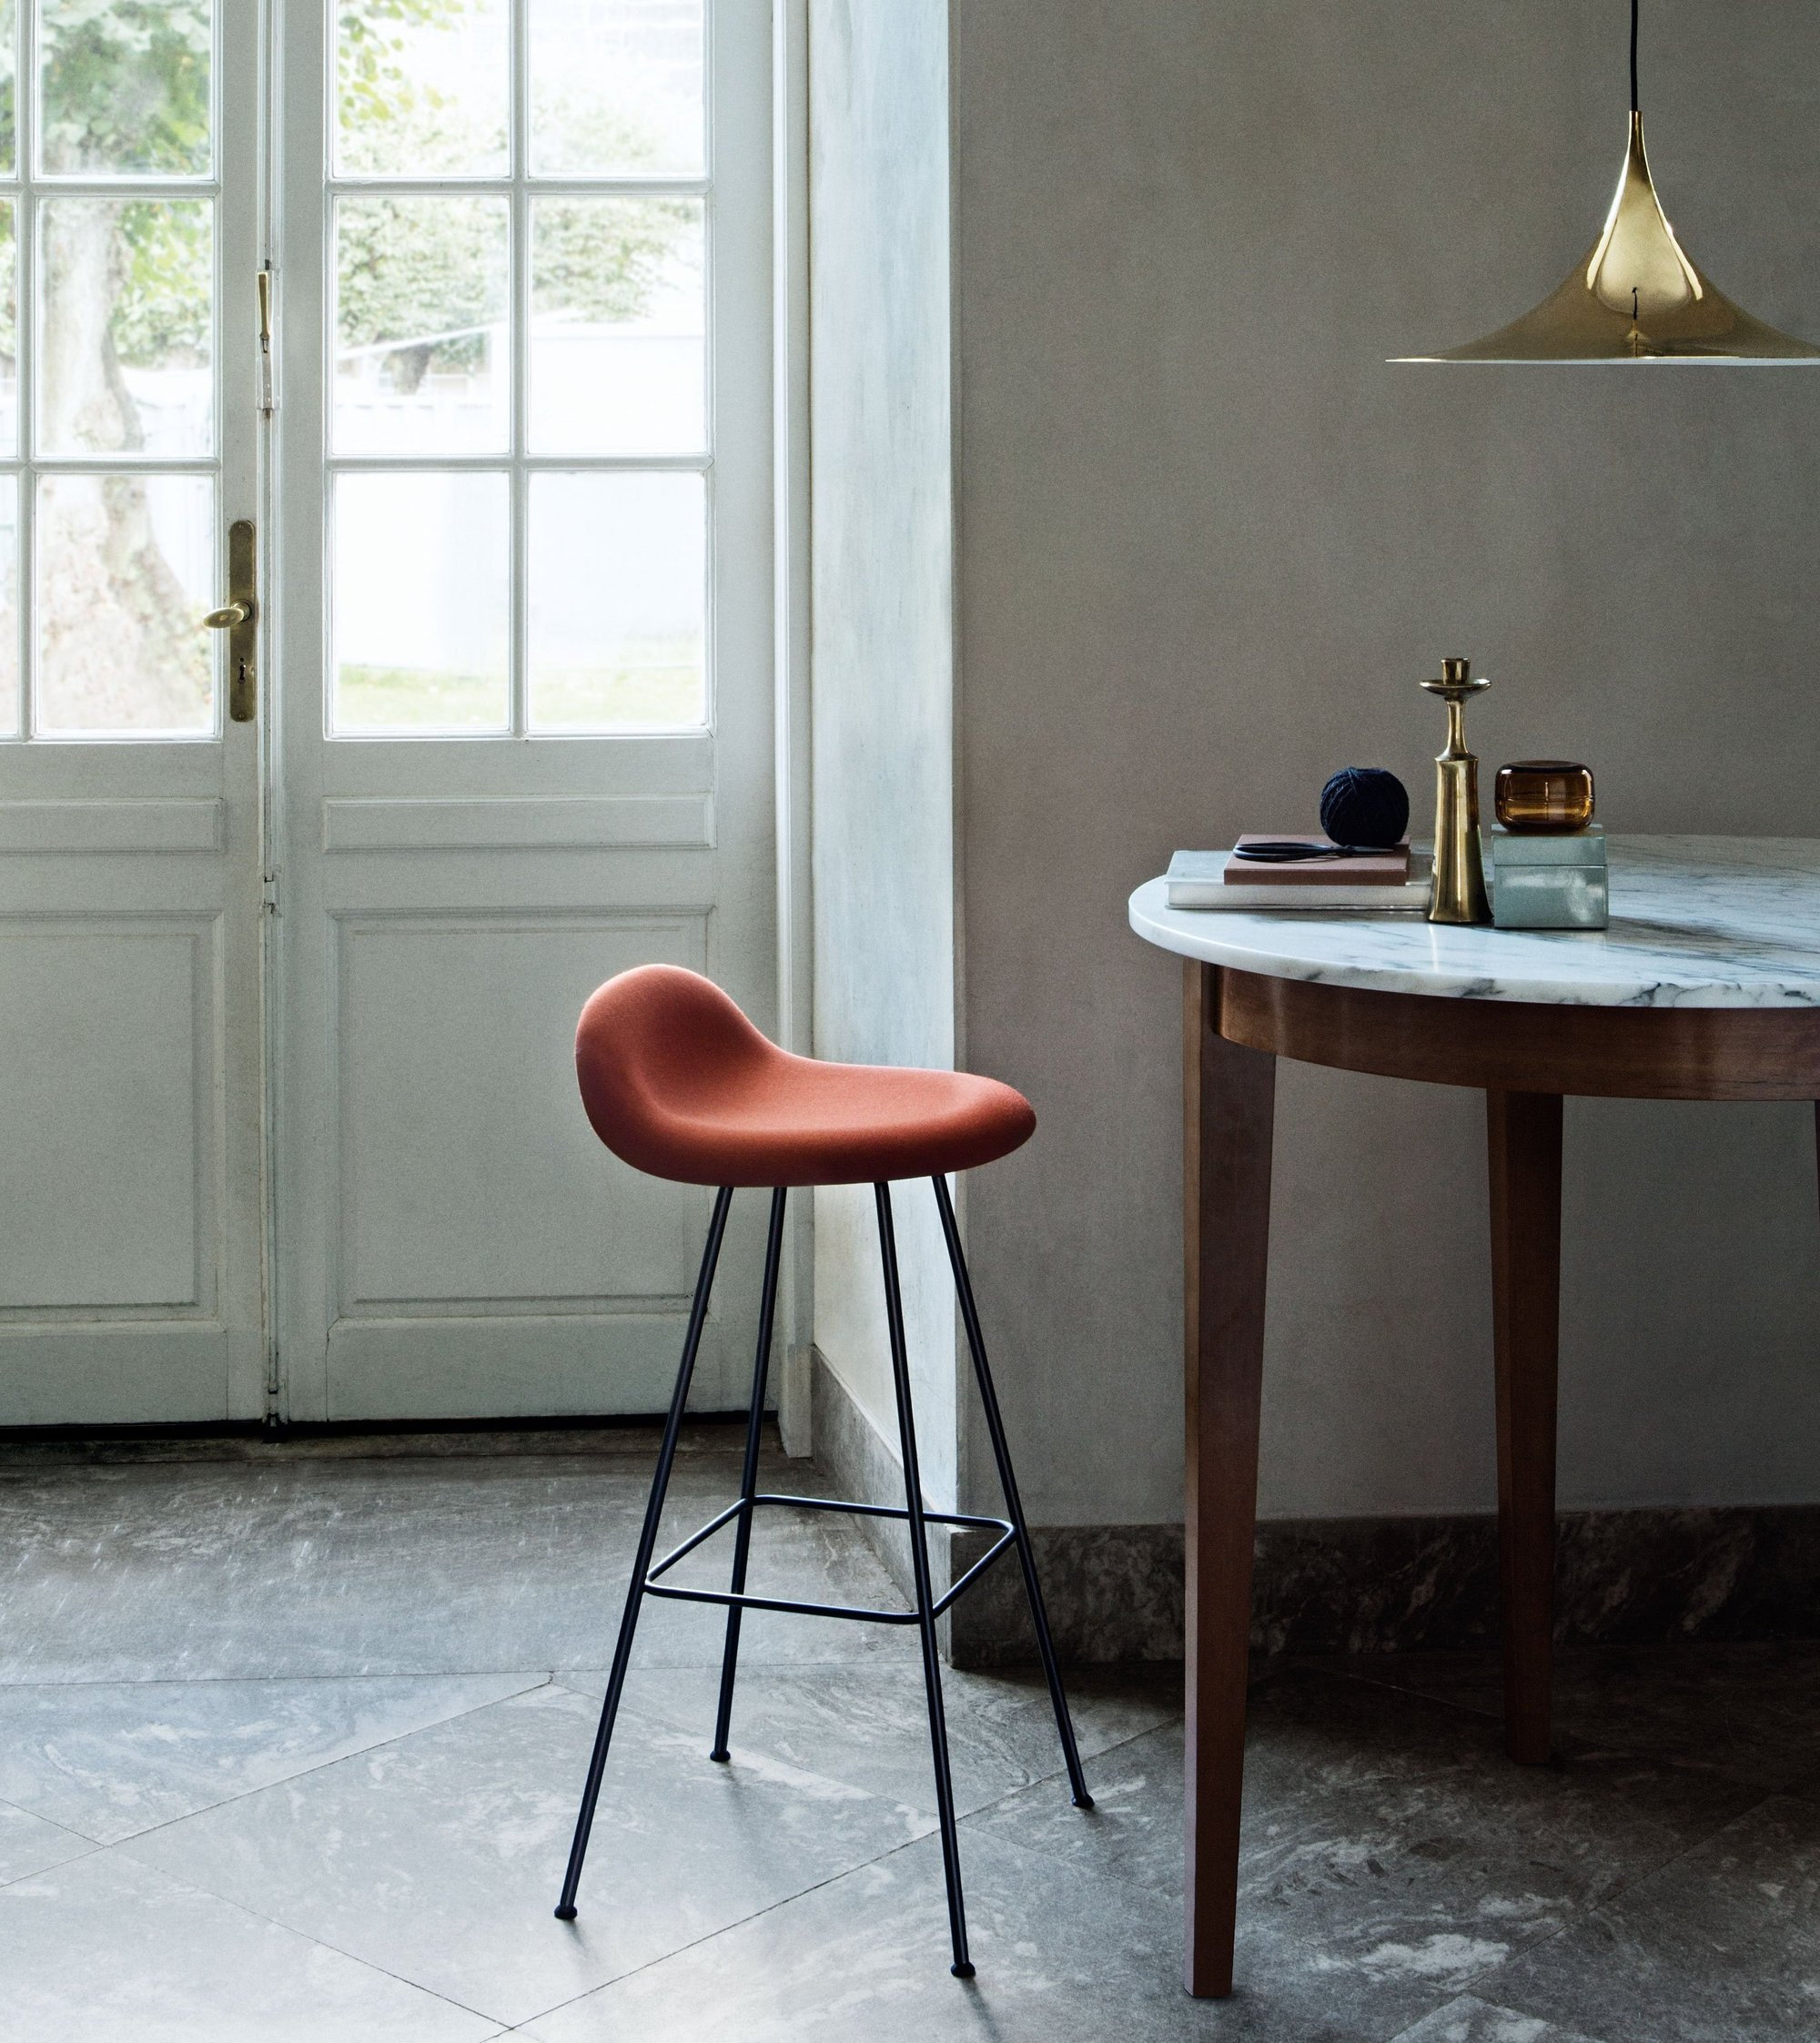 Scandinavia Dreaming coffee table books